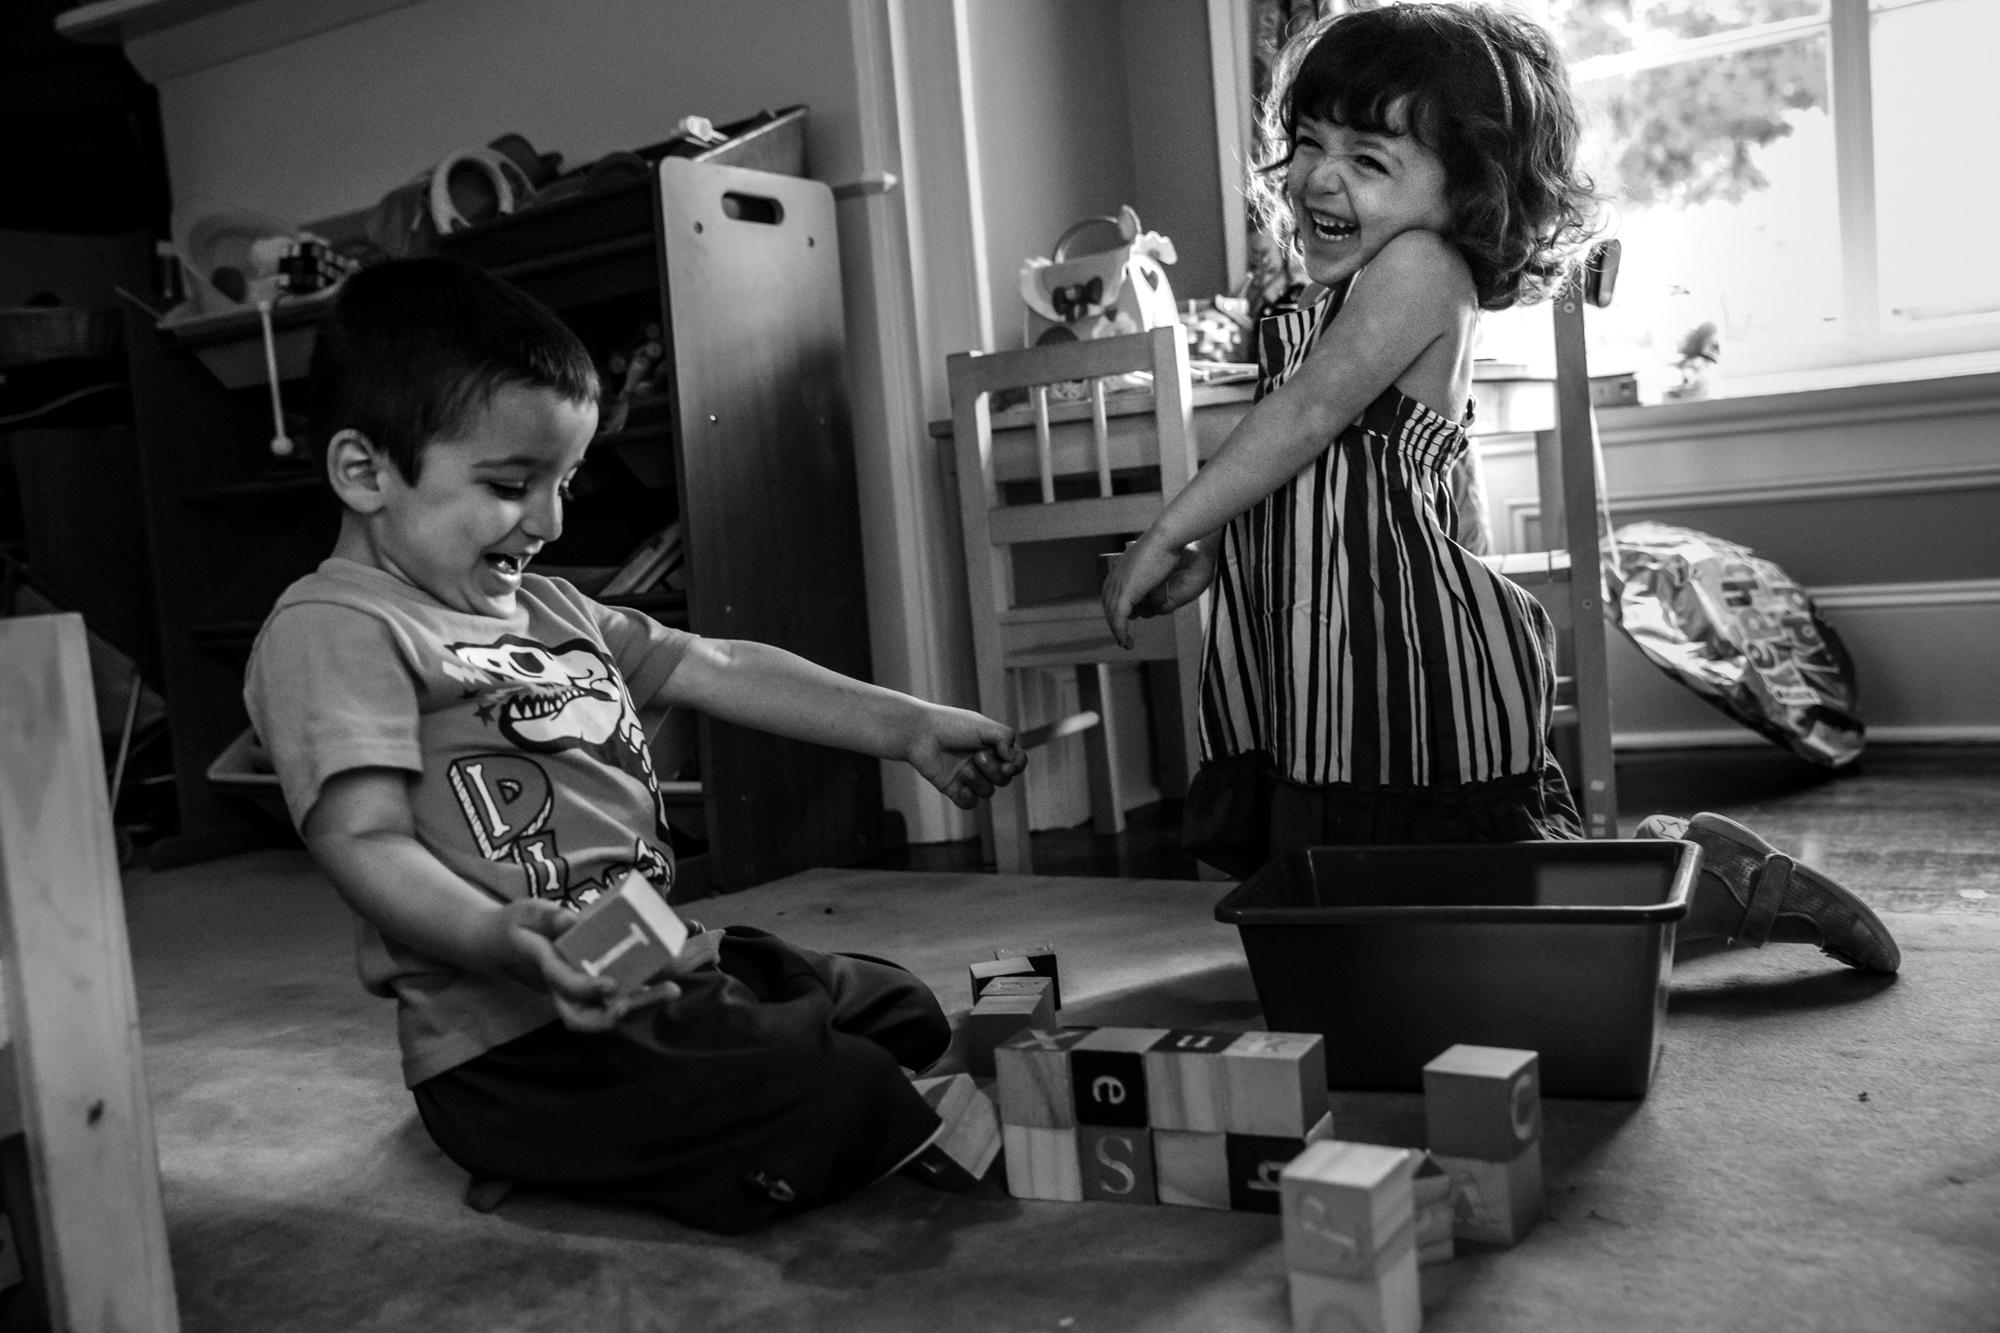 Boy knocks down toy blocks while girl laughs